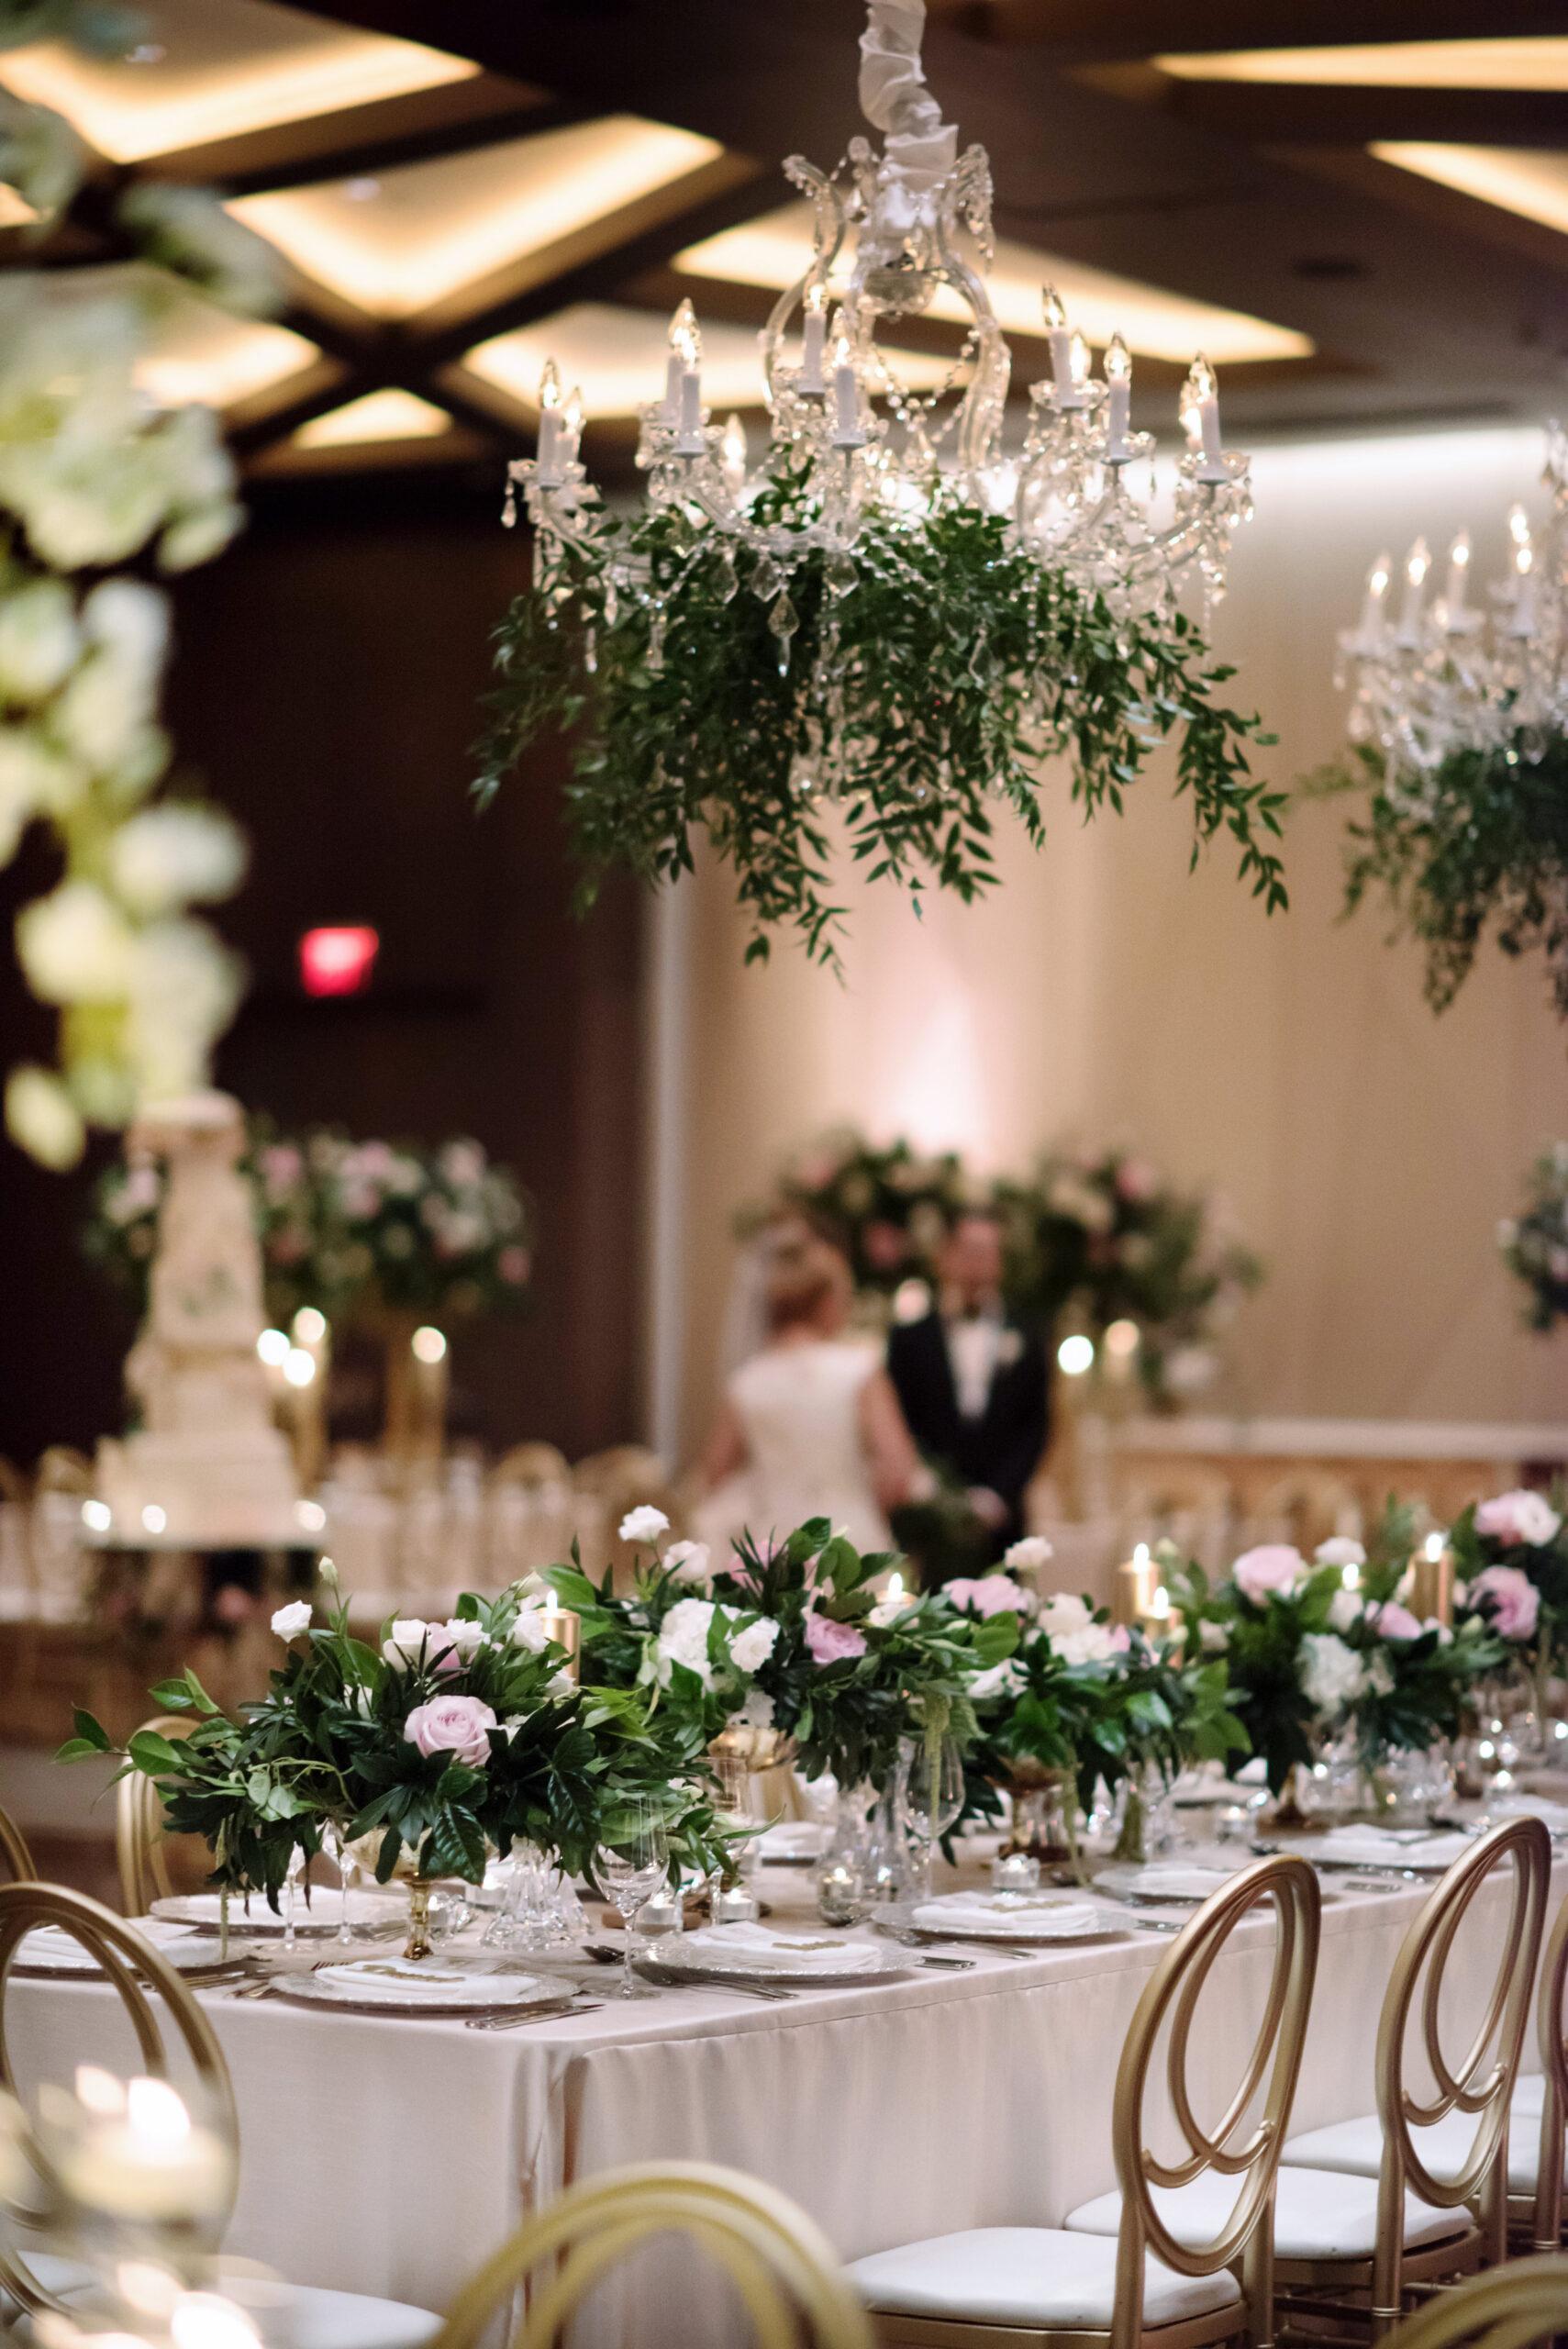 https://secureservercdn.net/45.40.145.151/kgq.ab5.myftpupload.com/wp-content/uploads/2020/04/Sanam-Soroush-s-Wedding-wedluxe-submission-0076-scaled.jpg?time=1600462602